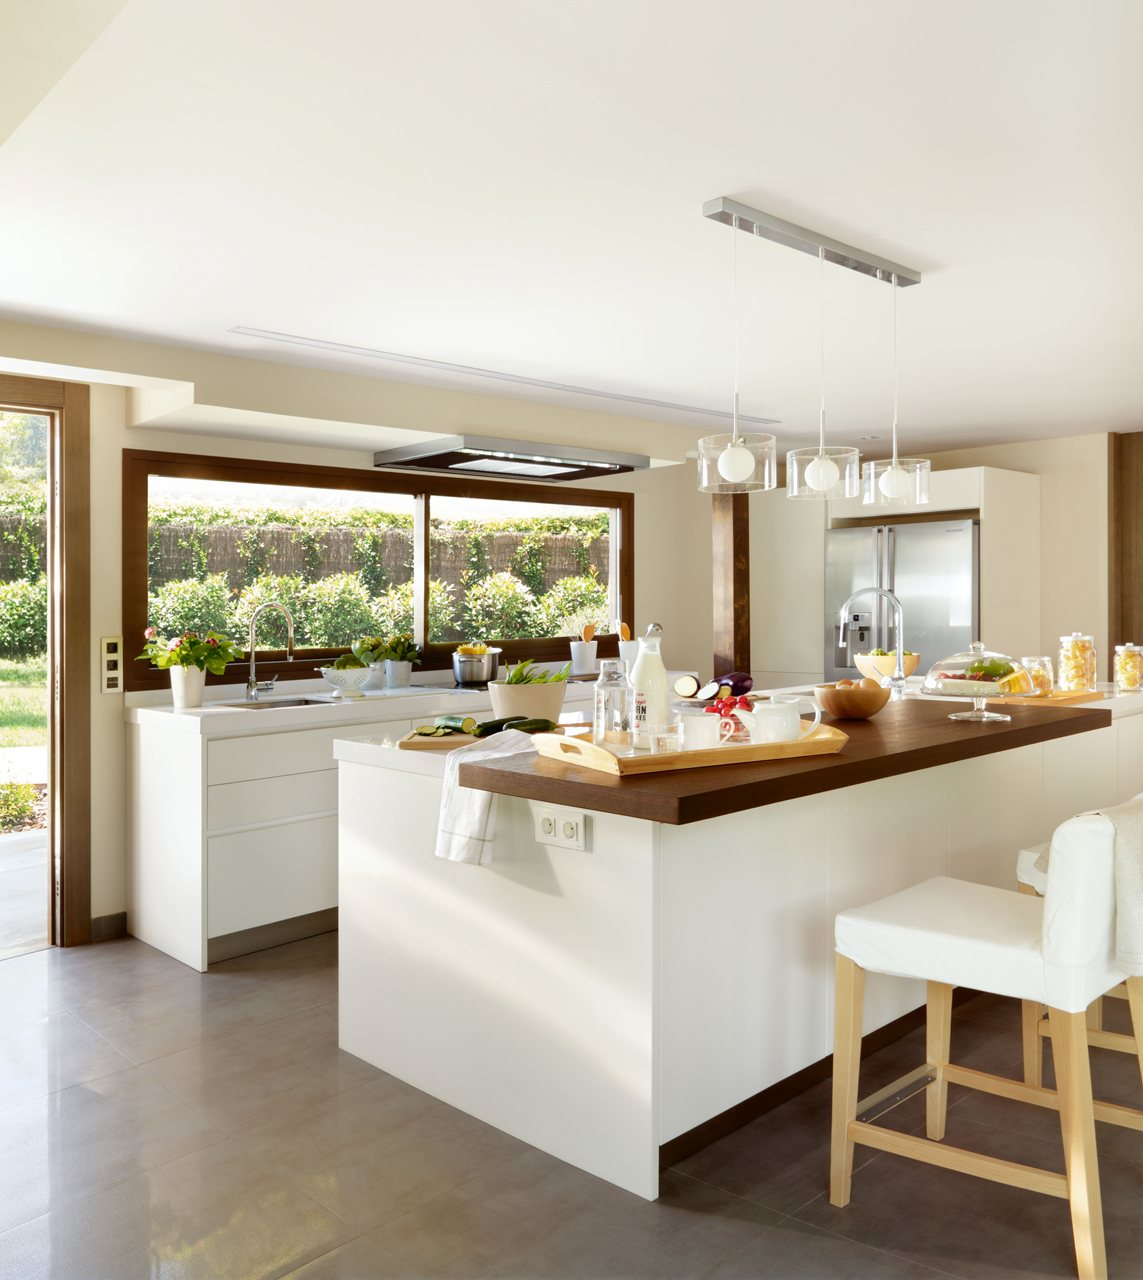 Tres cocinas amplias luminosas y frescas for Mostrar cocinas modernas